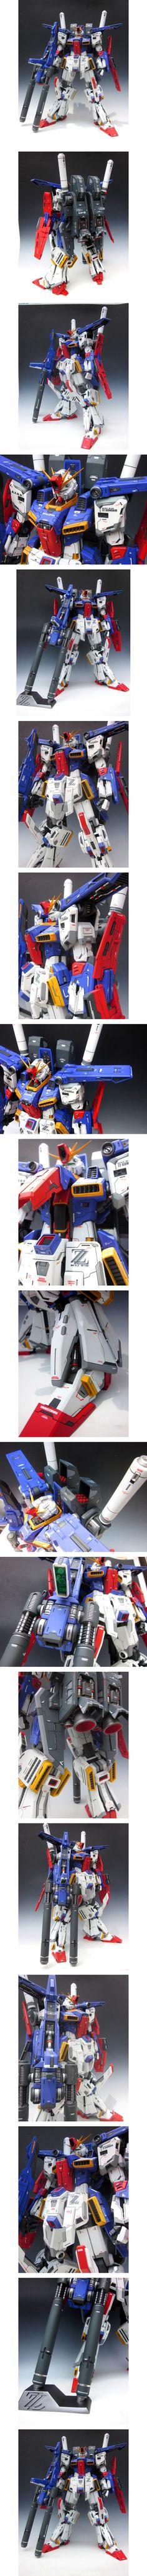 [NG] 1/60 MSZ-010 ZZ Gundam 改 Work by kazu462384 Photoreview | gunjap